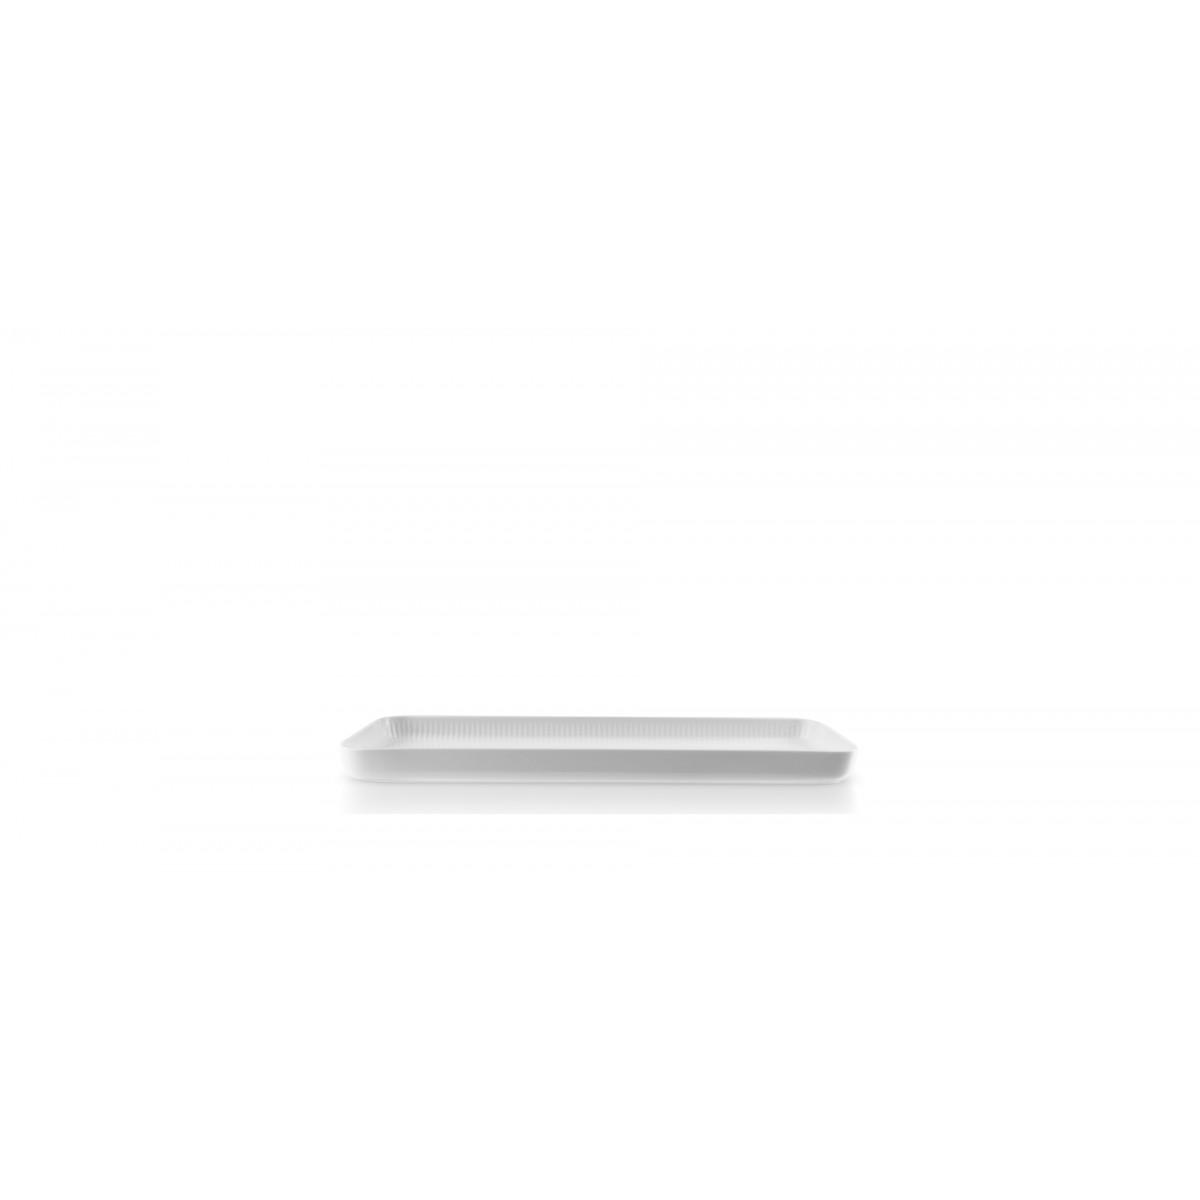 EVASOLOLegionovaserveringsfad37x13cm-03